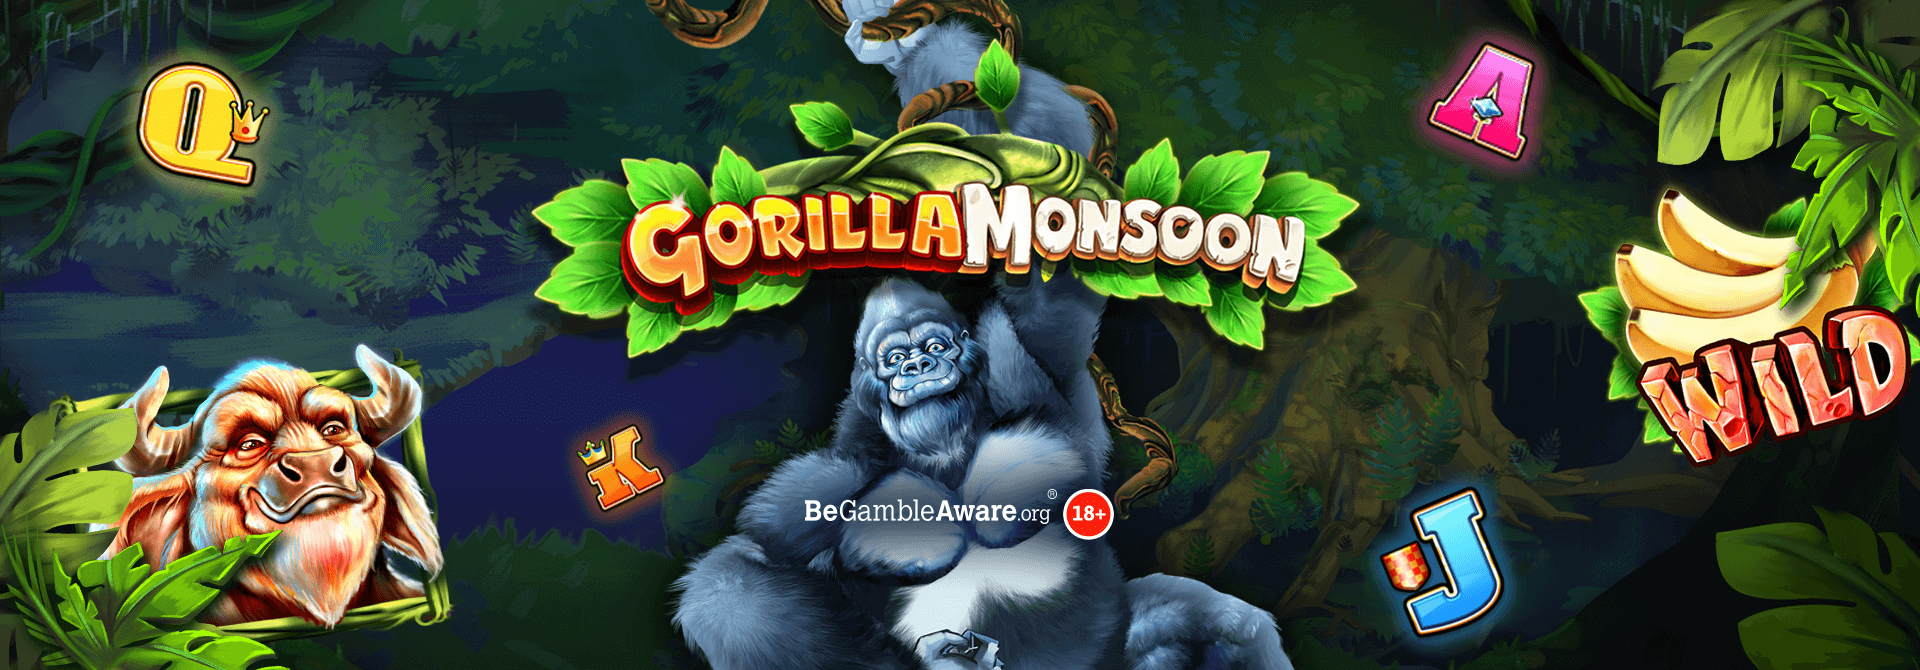 Can you rain down wins on Gorilla Monsoon?